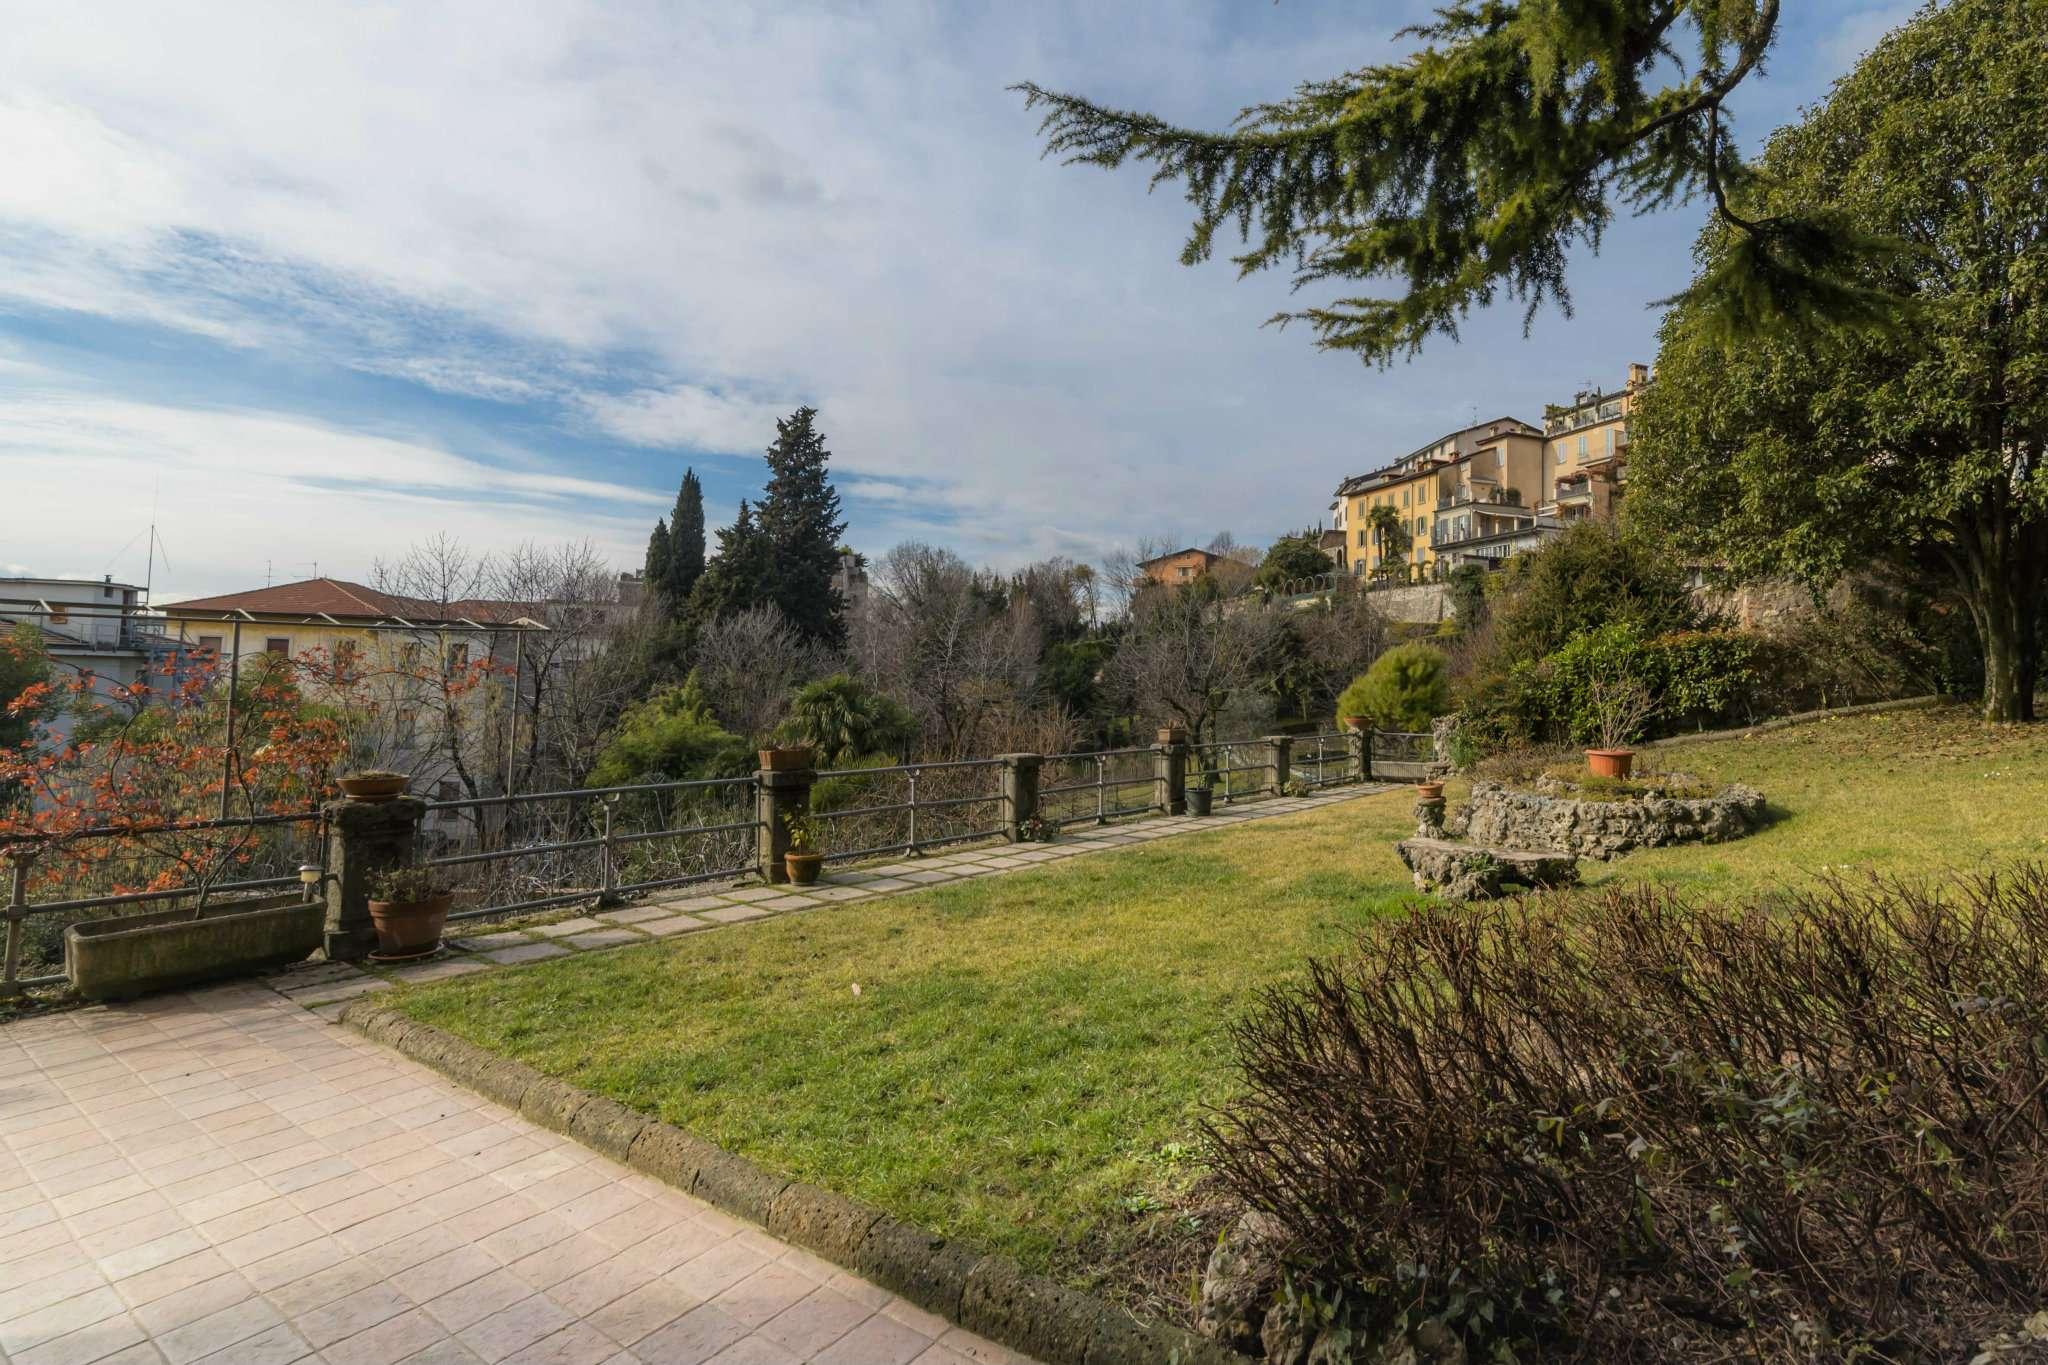 Appartamento, via s. alessandro 100, Centro Storico, Sant'Anna, Pignolo, Vendita - Bergamo (BG)